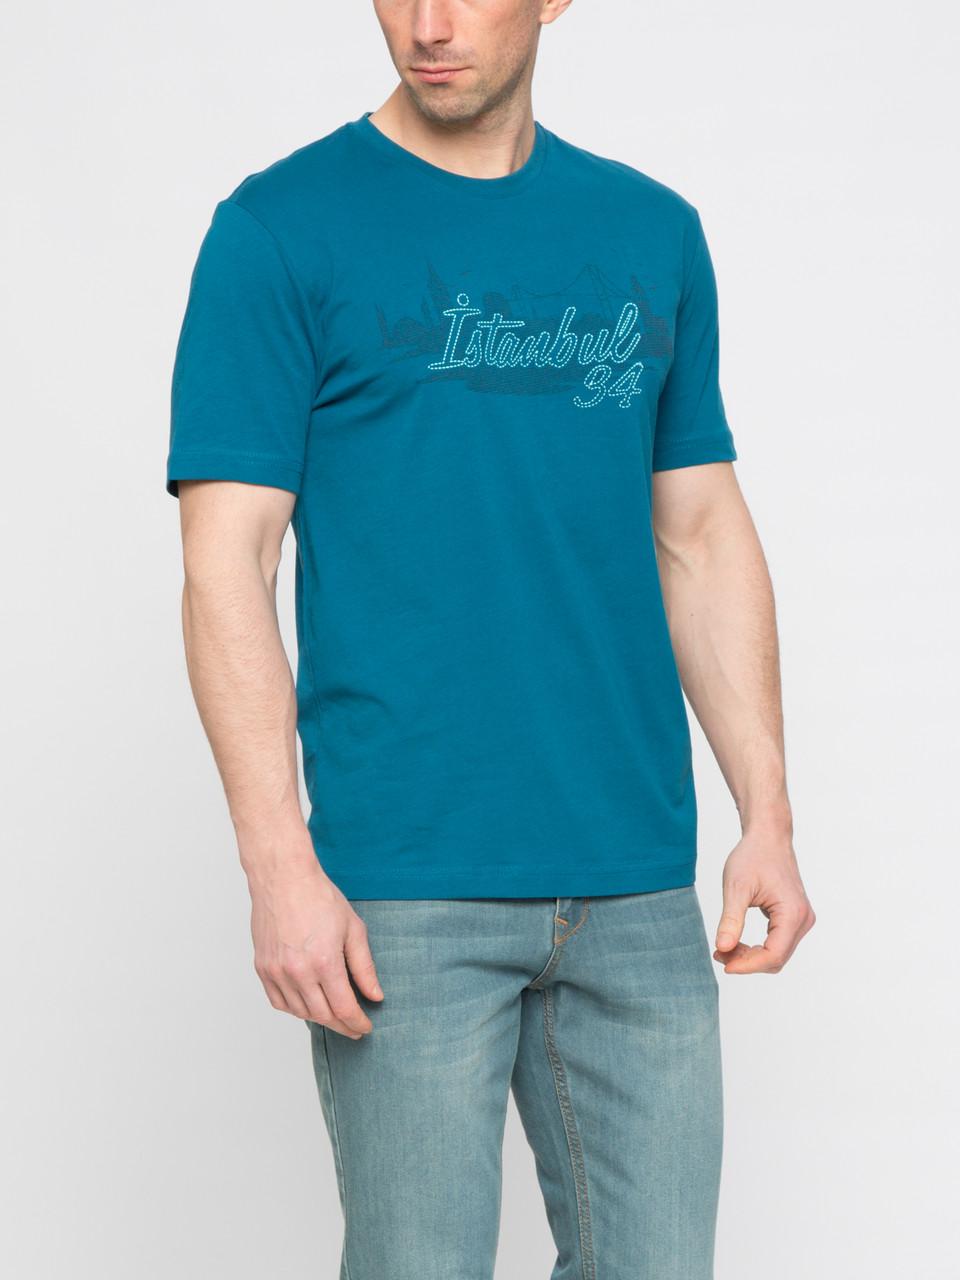 Мужская футболка LC Waikiki изумрудного цвета с надписью на груди Istanbul 94